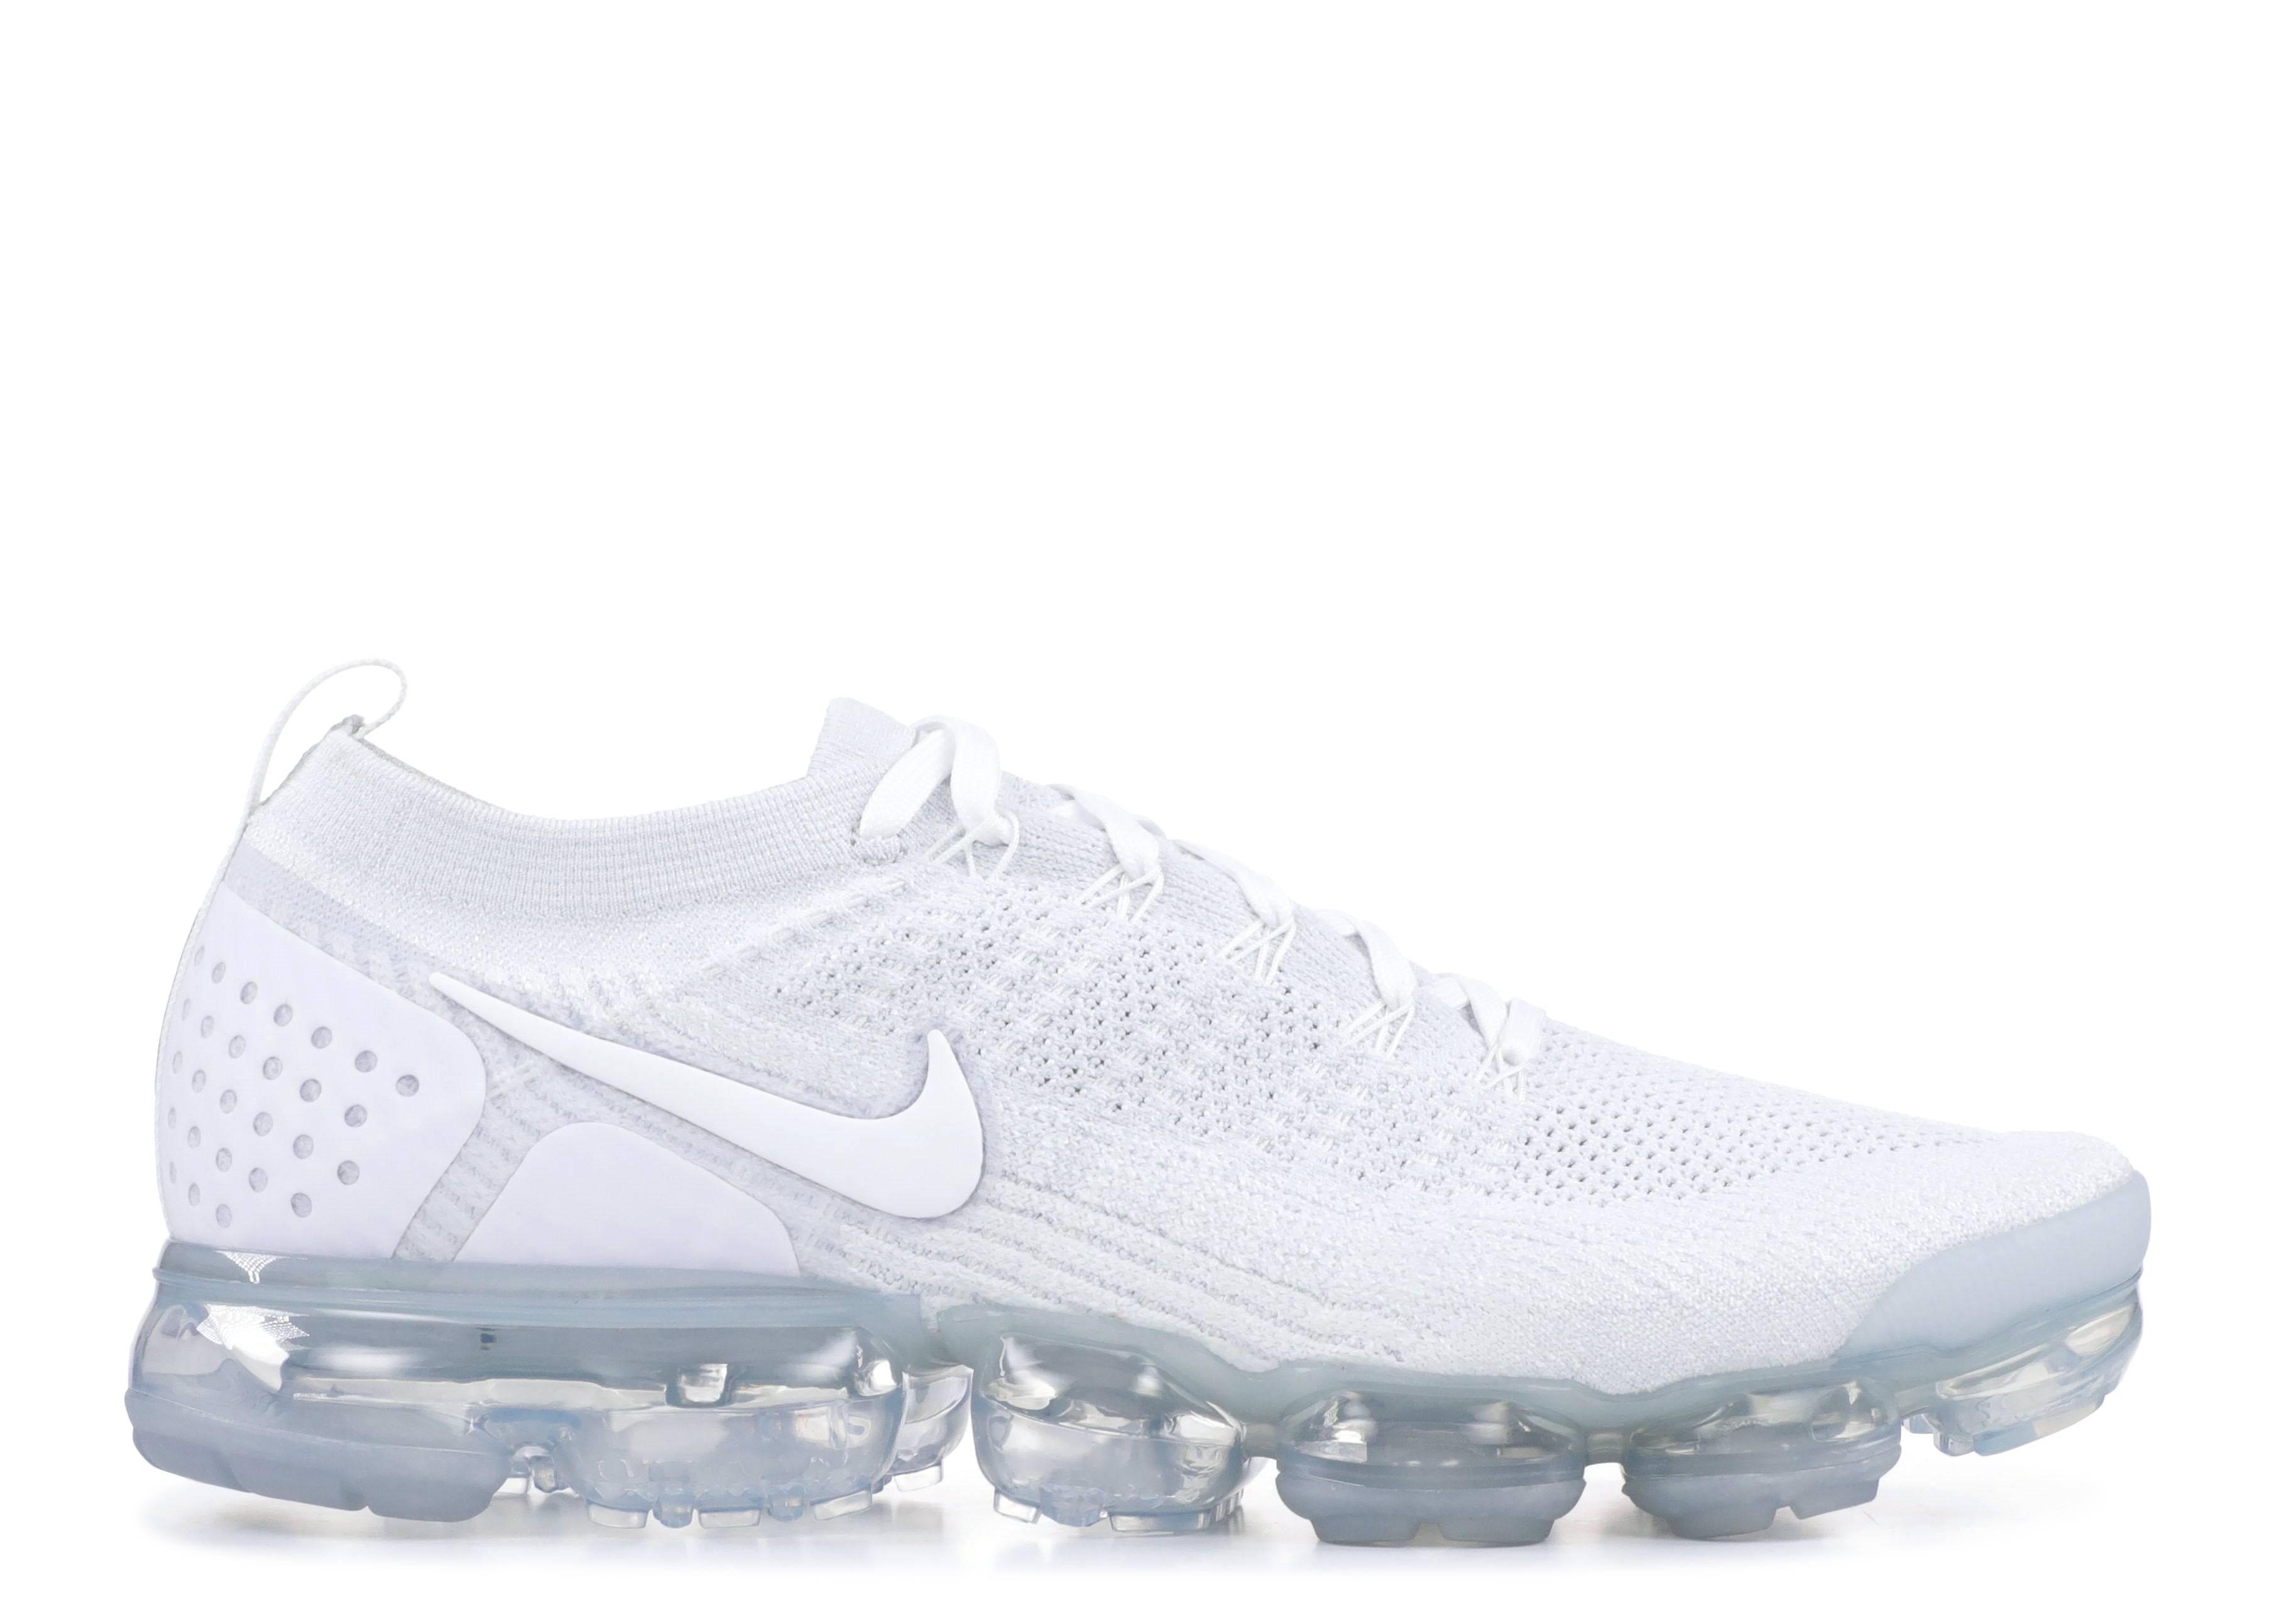 68c93933f4ffd Air Vapormax Flyknit 2 - Nike - 942842 100 - white white-pure ...